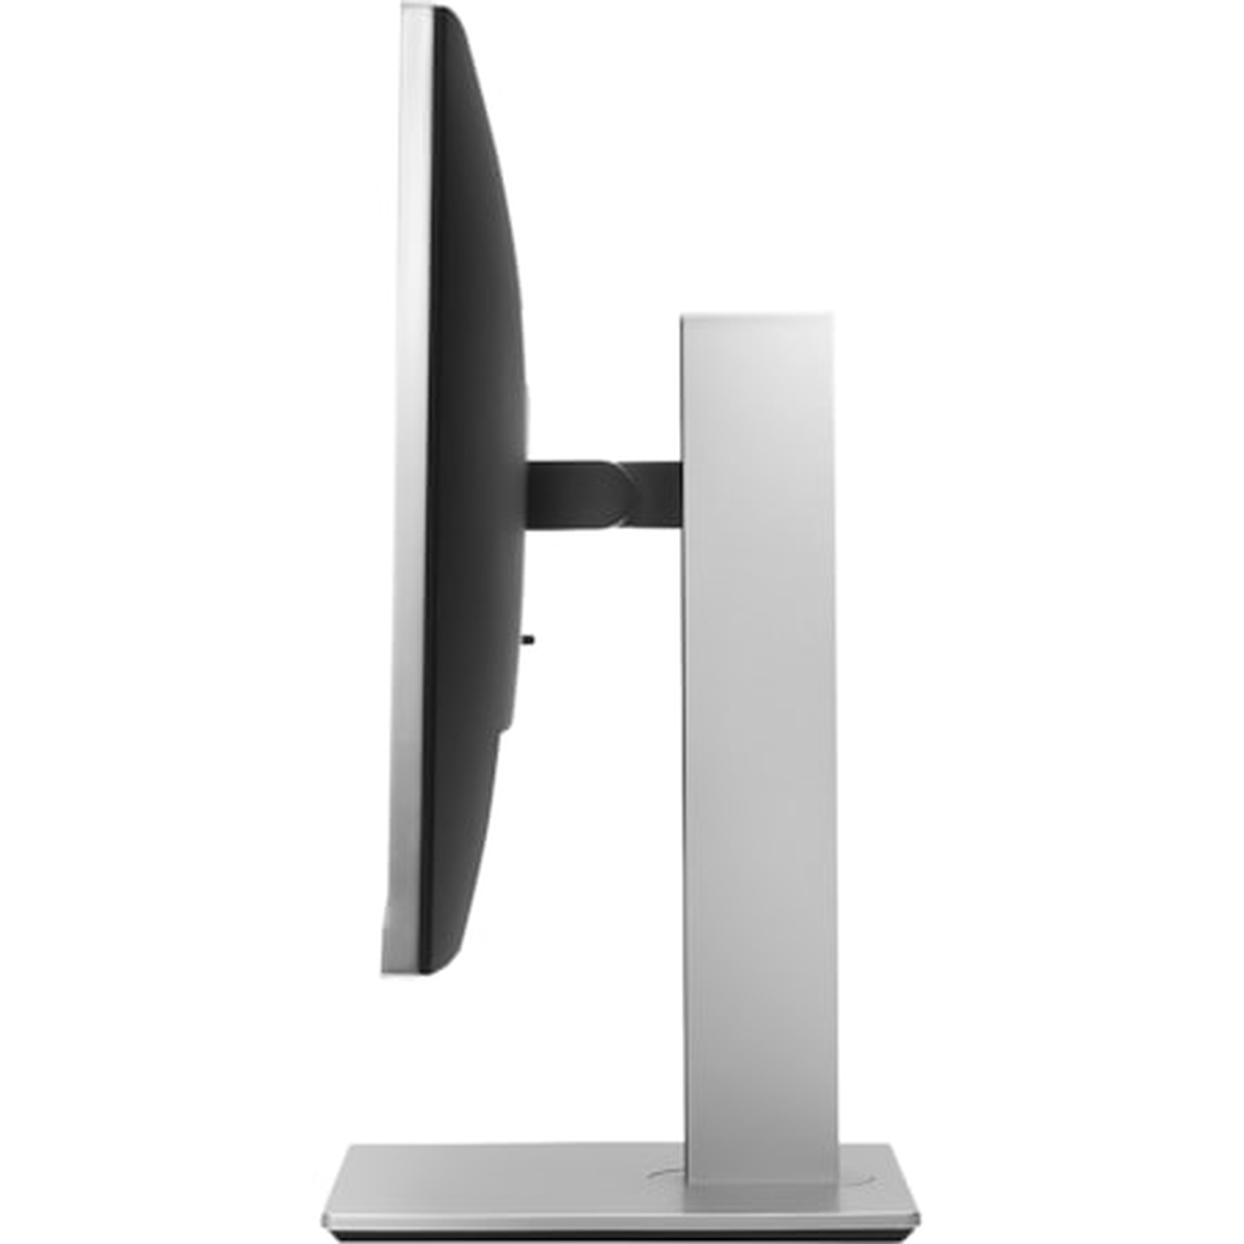 "HP E233 58.4 cm (23"") Full HD LED LCD Monitor - 16:9 - Silver, Black"